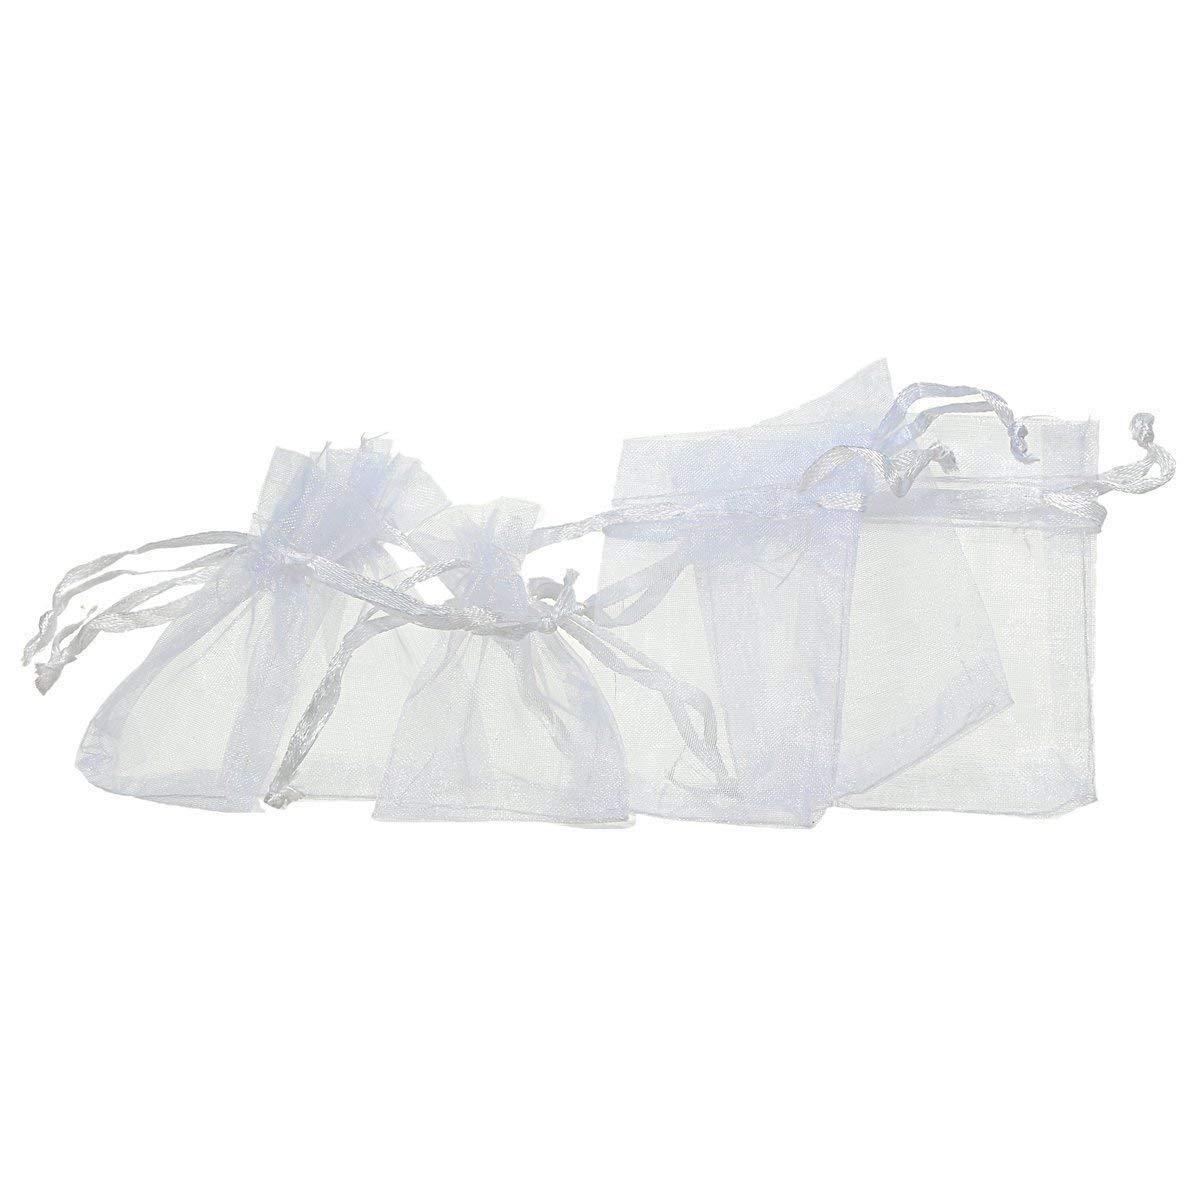 Aofocy Paquete de 100 Bolsas de Regalo de Boda de Organza Blanca